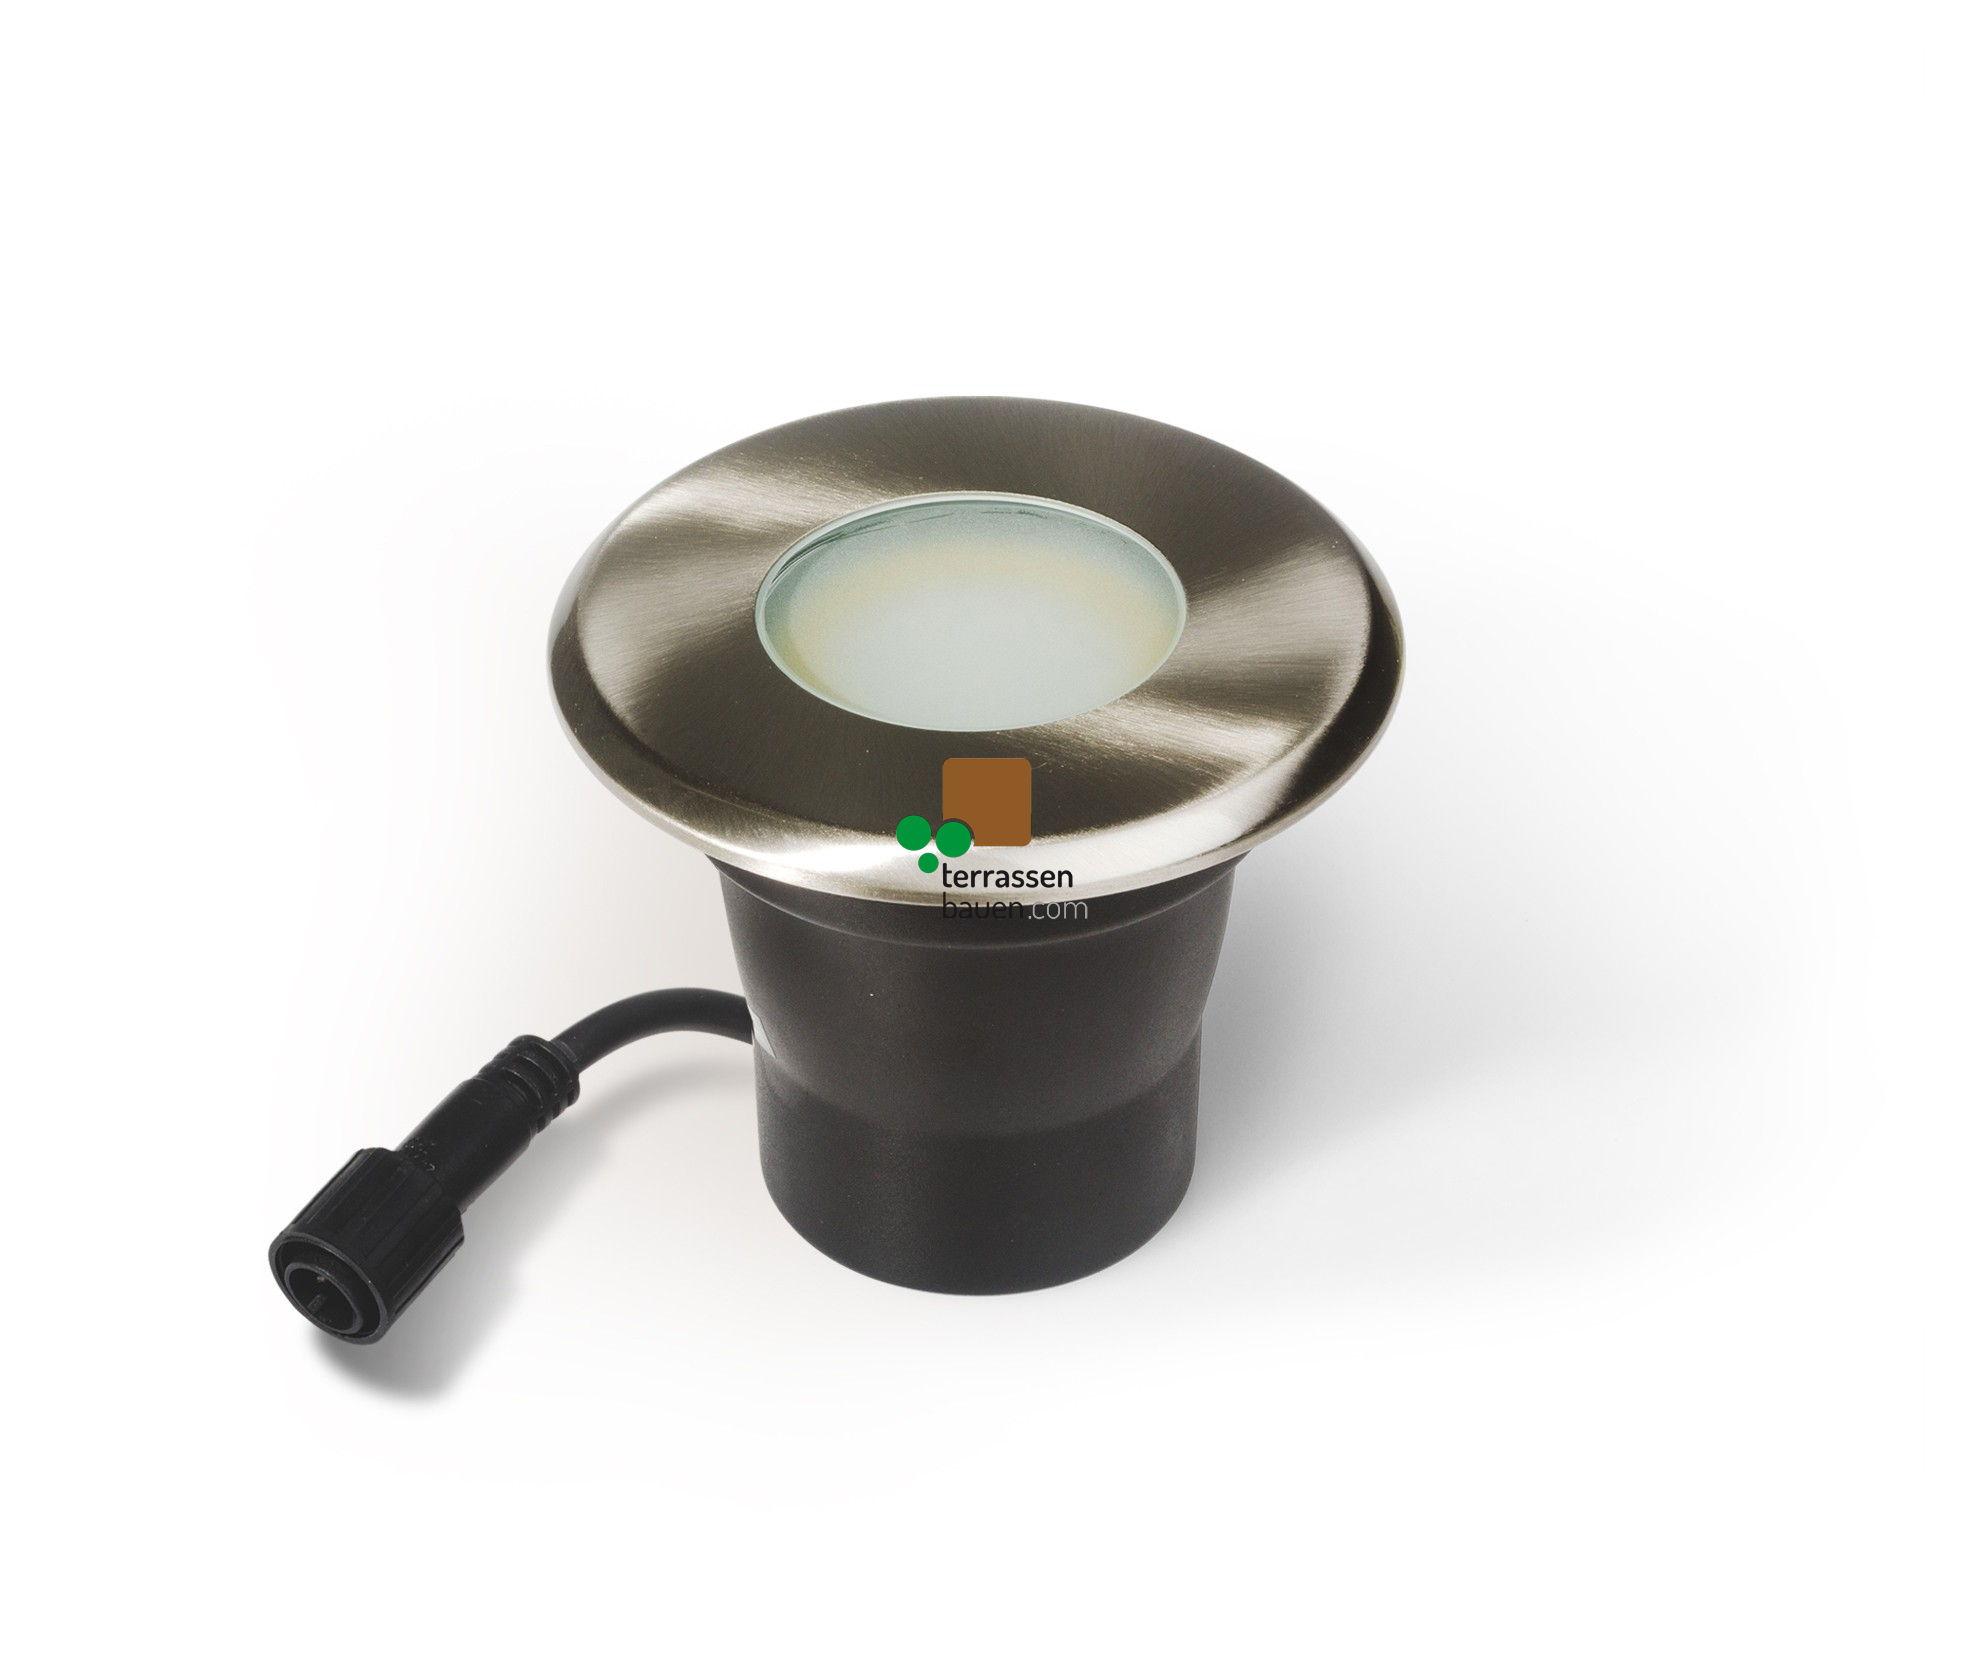 EasyConnect Edelstahl LED Einbauleuchte ø 120mm, 230VAC, 1 Stück